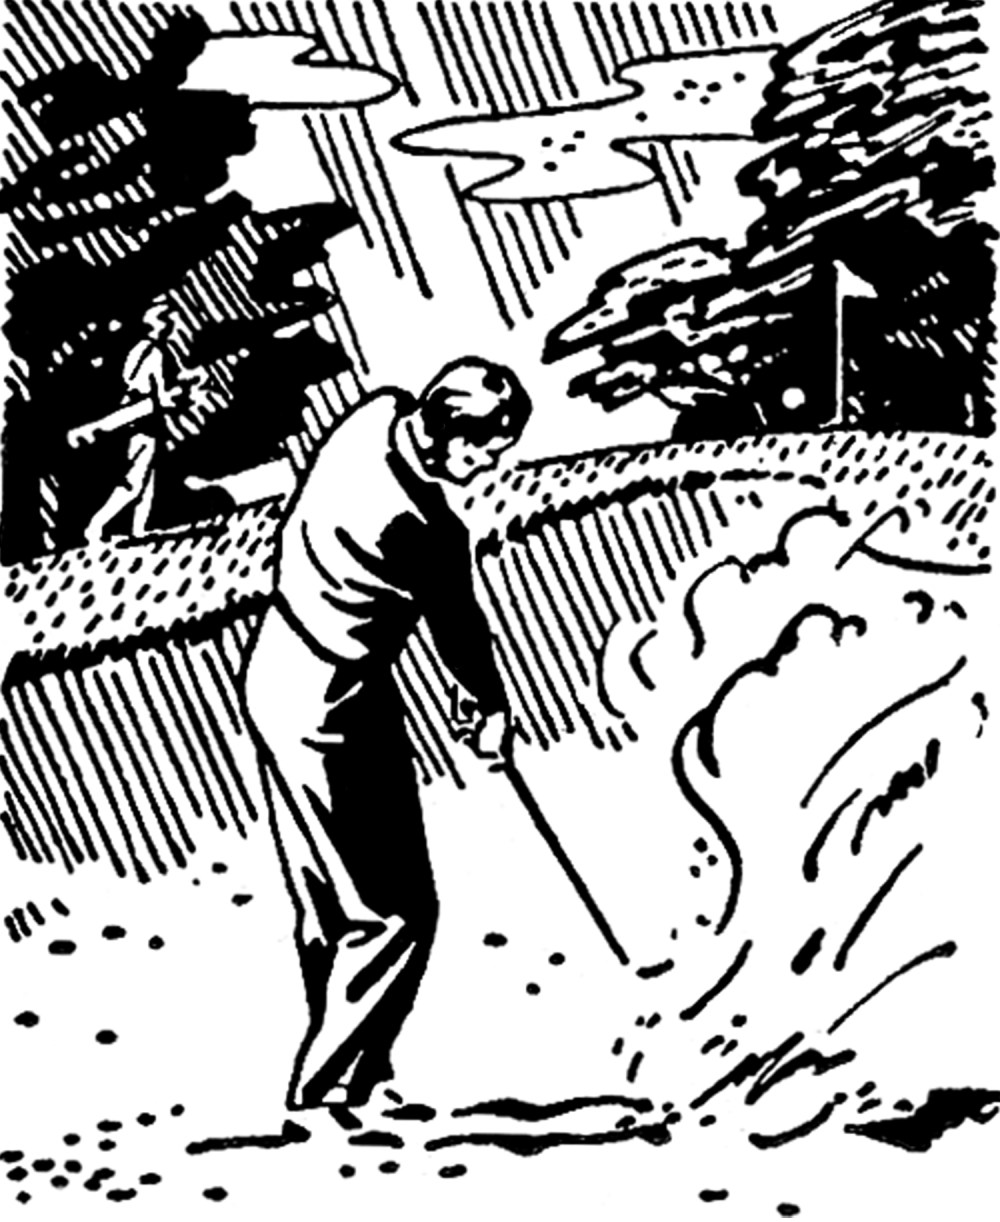 medium resolution of retro golf images black and white clip art